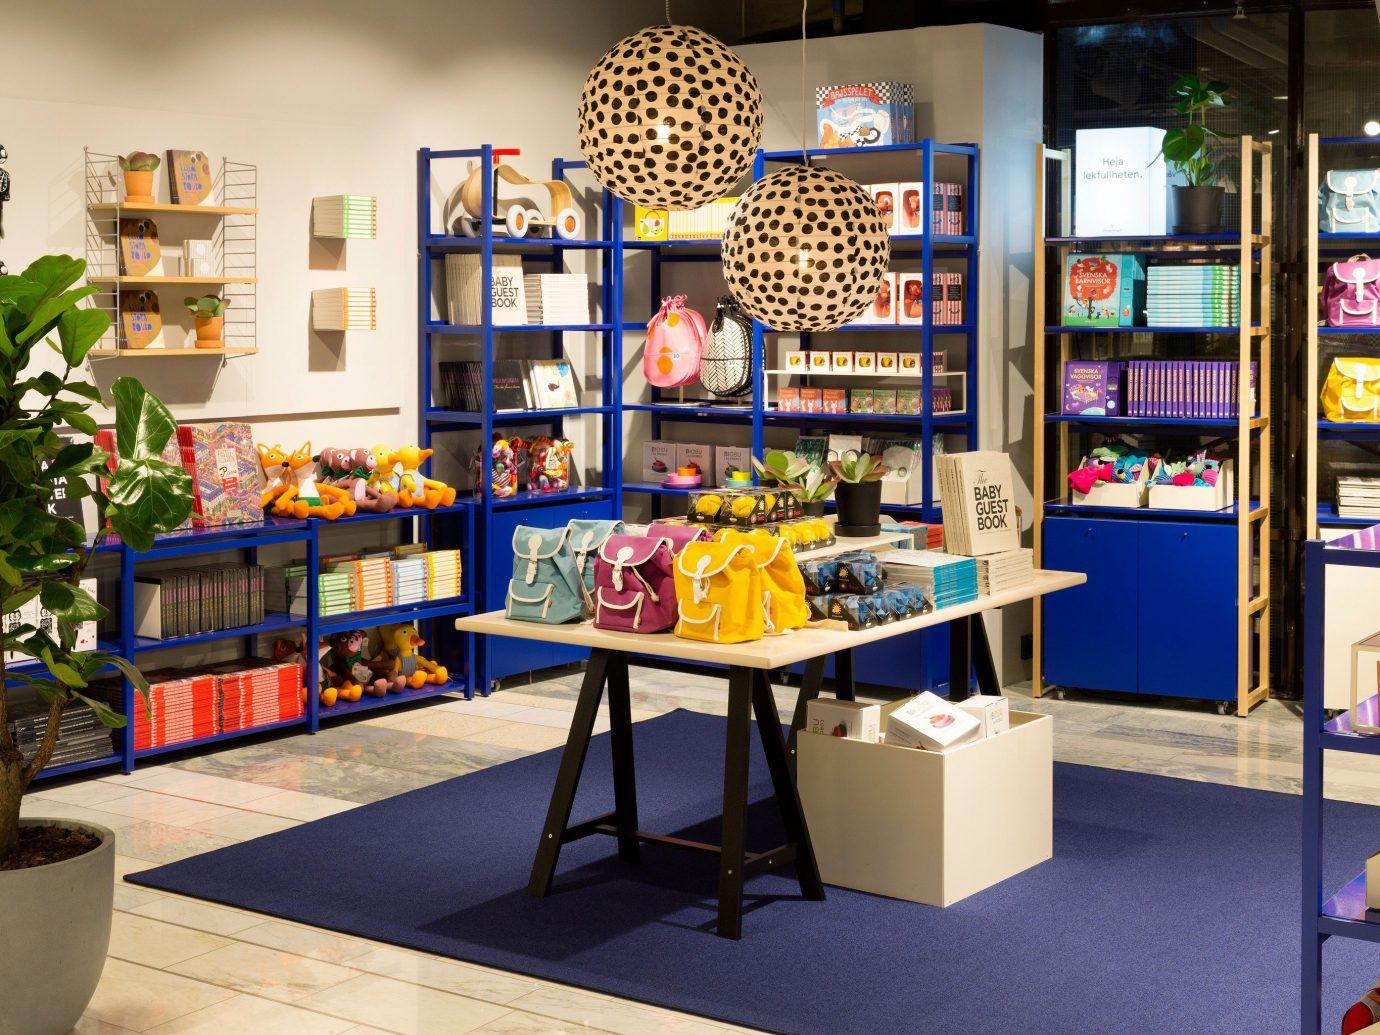 Style + Design indoor floor room building retail bookselling shelf art interior design Design library